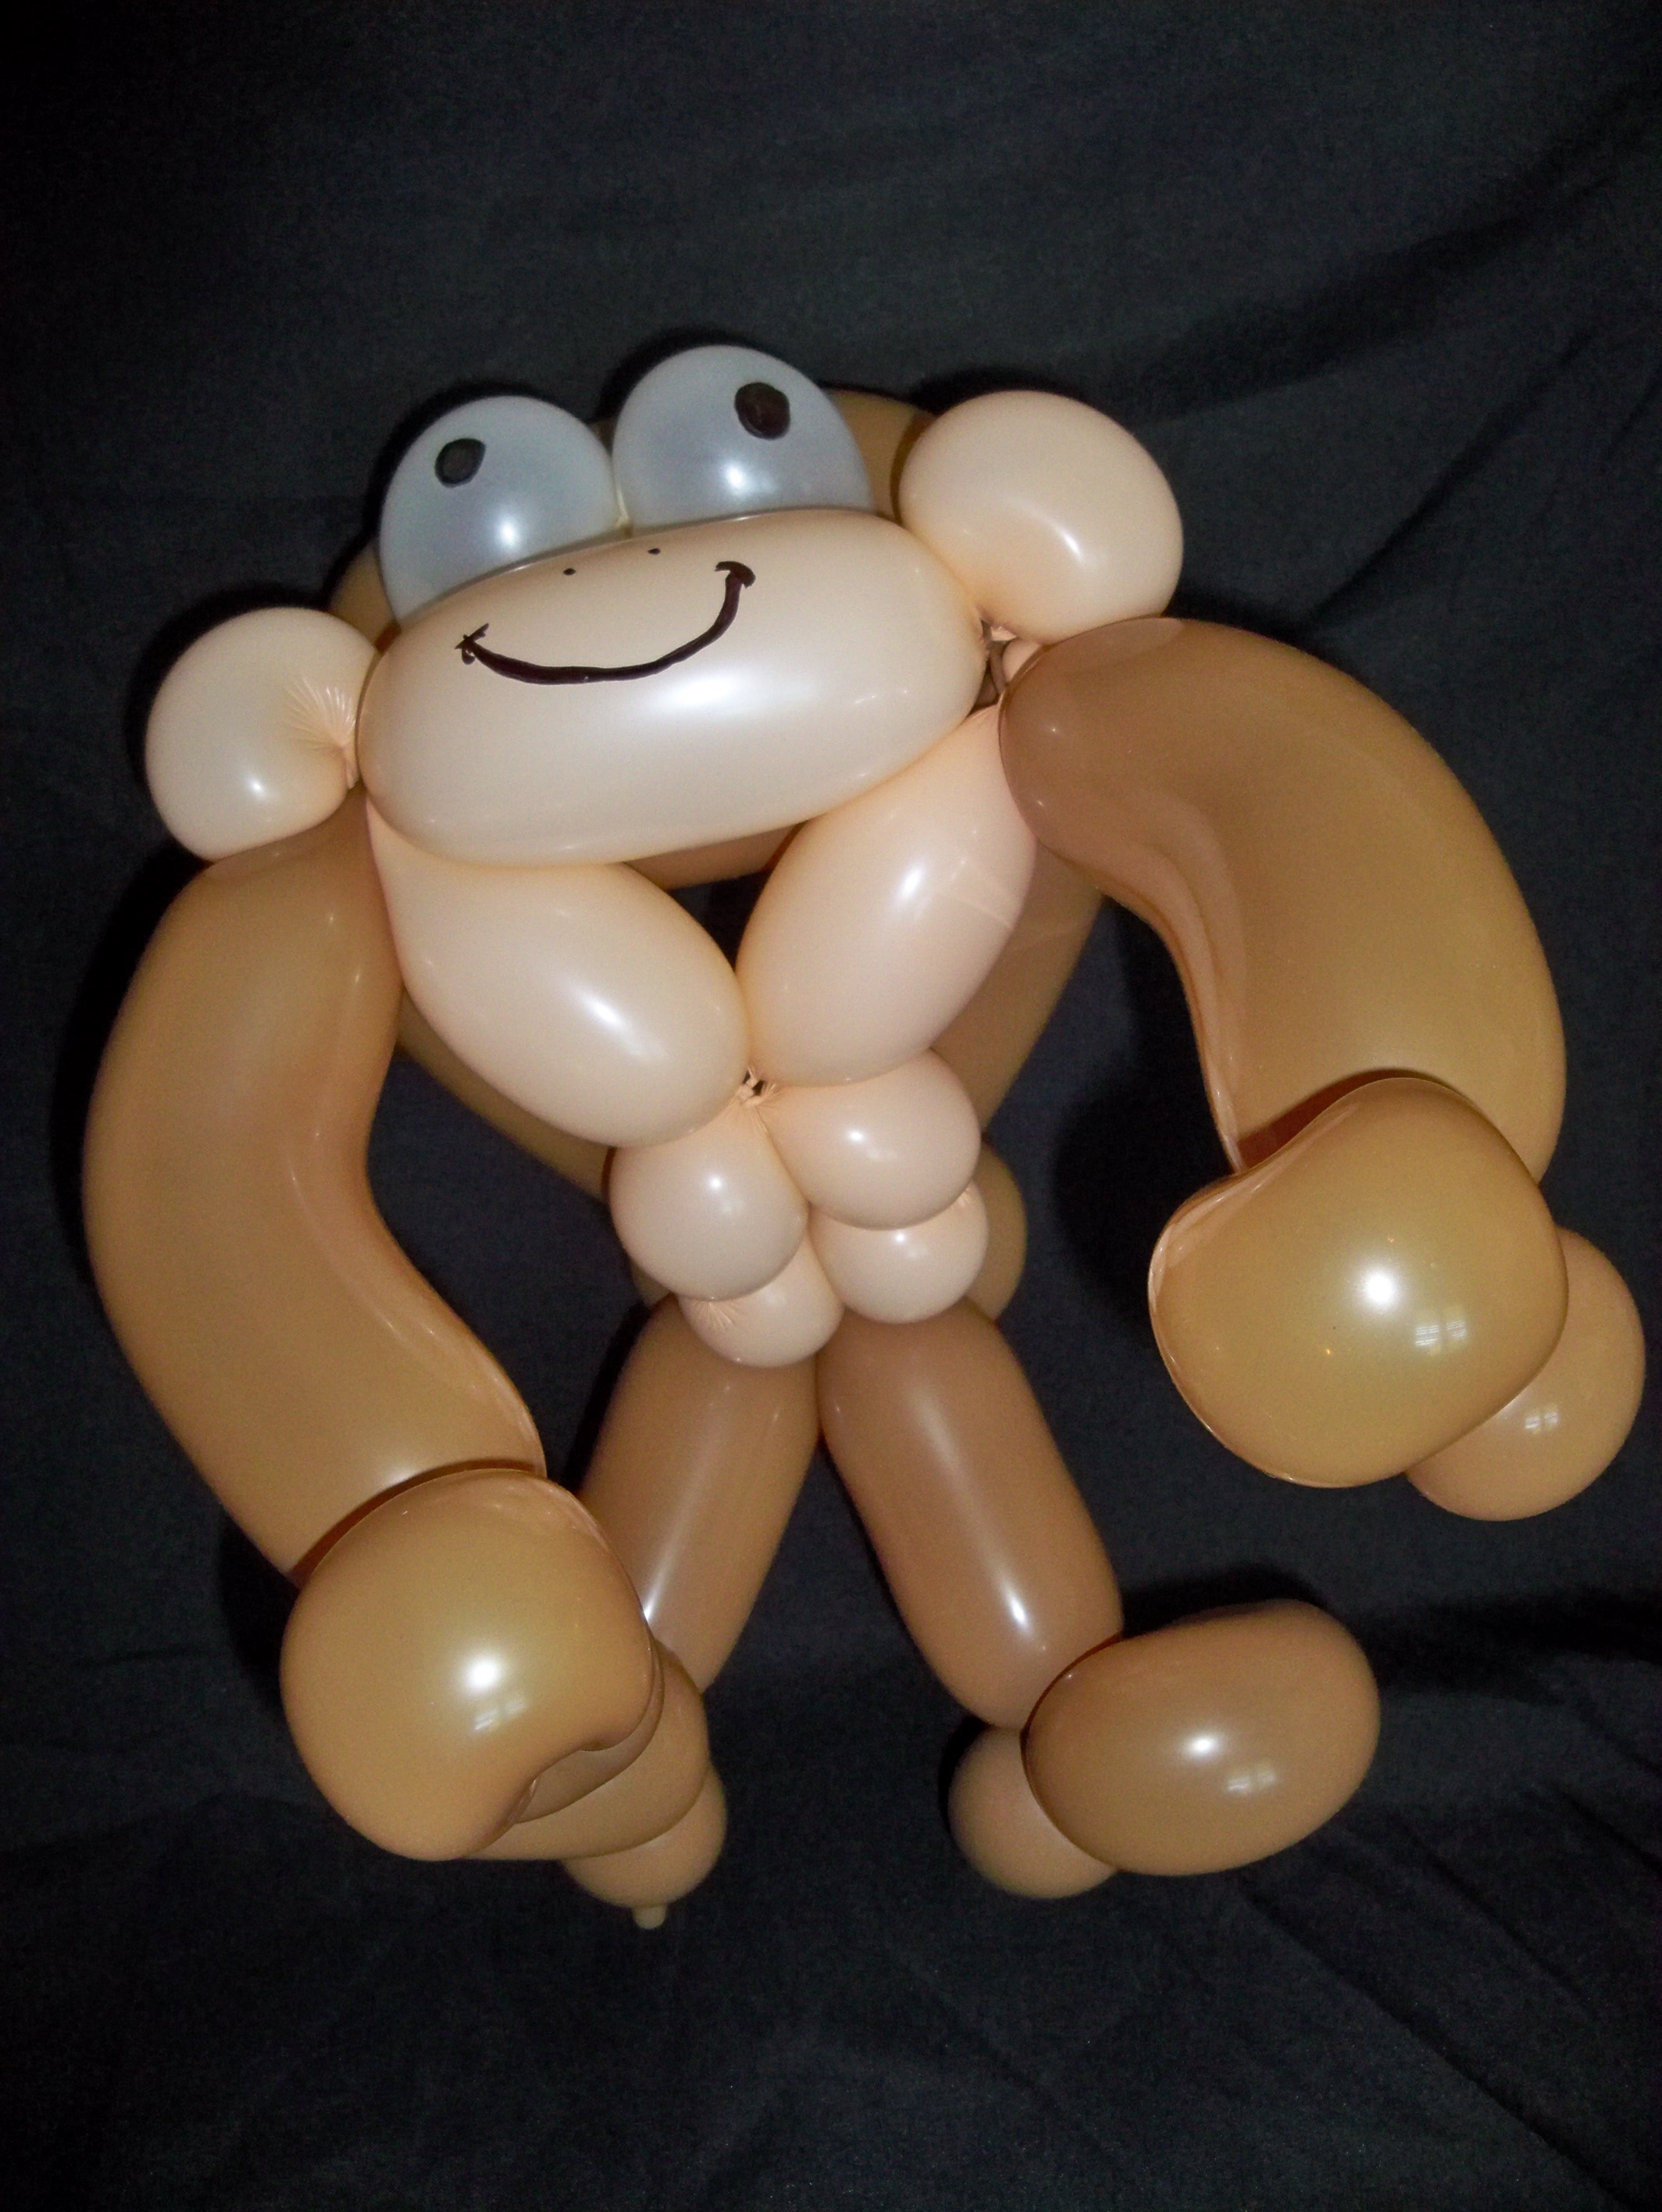 Balloon Twisted Monkey